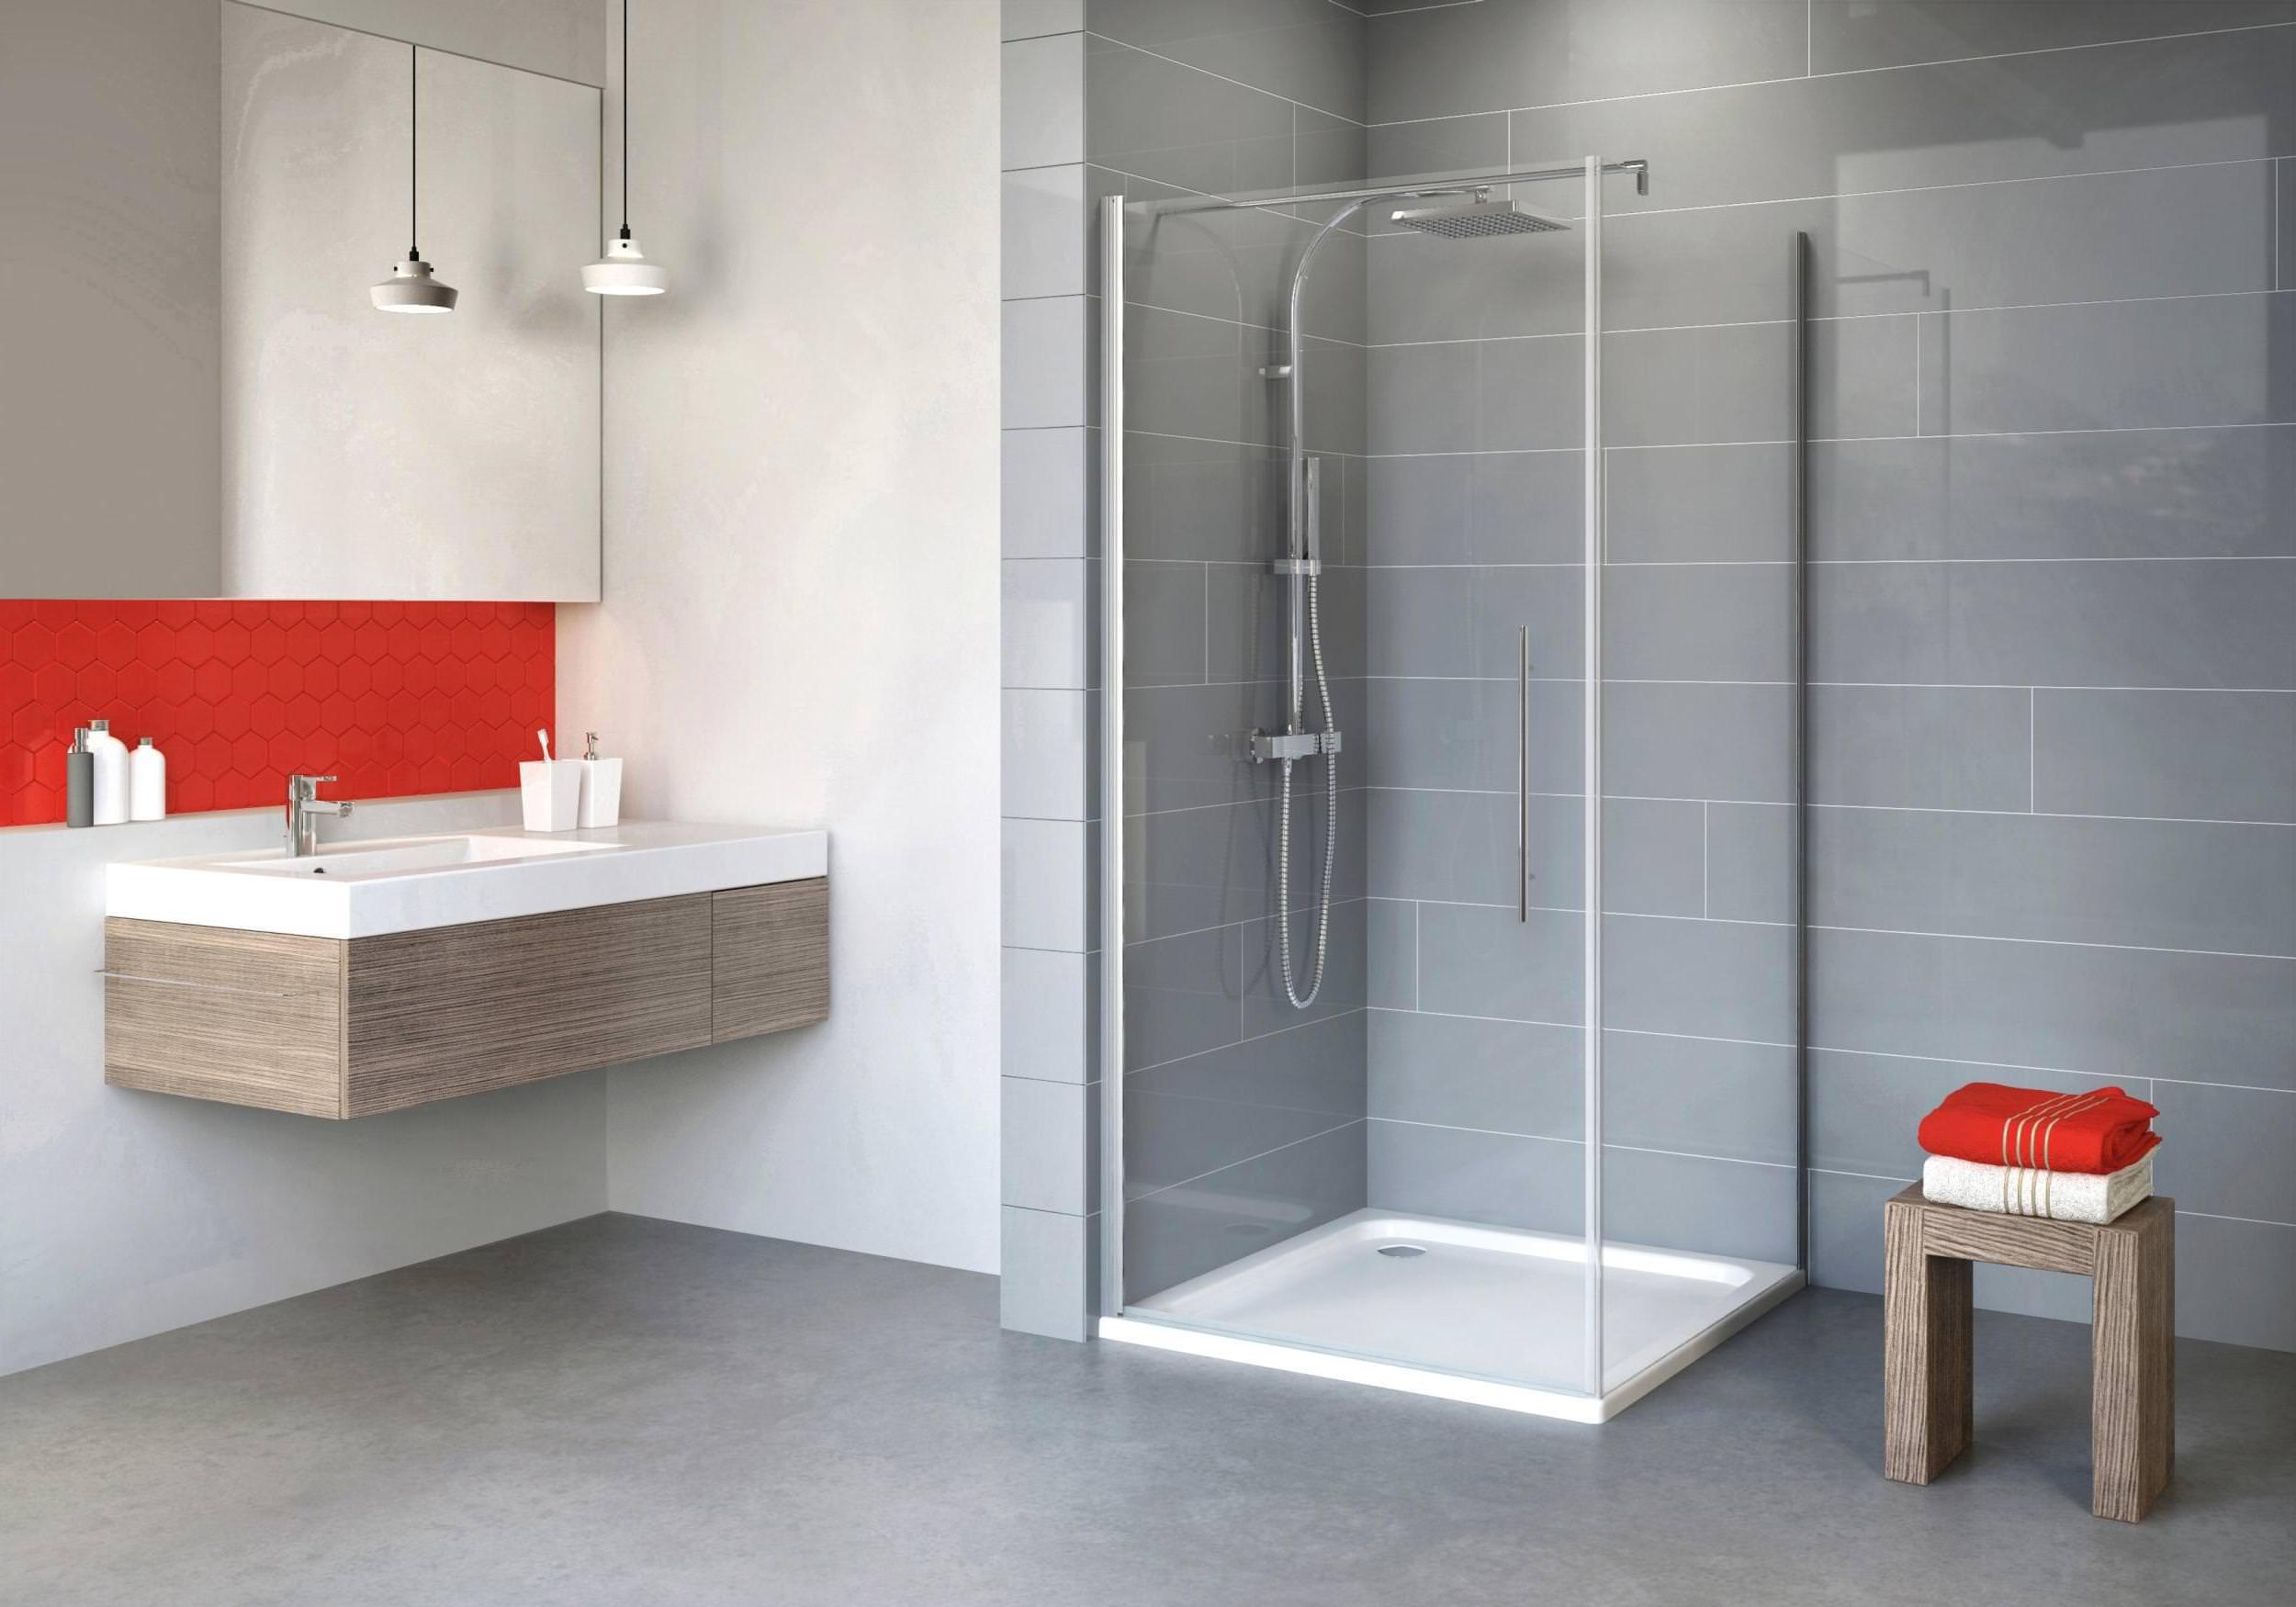 schulte alexa style 2 0 dreht r mit seitenwand klarglas hell alunatur 80 x 80 cm 192 cm sw. Black Bedroom Furniture Sets. Home Design Ideas